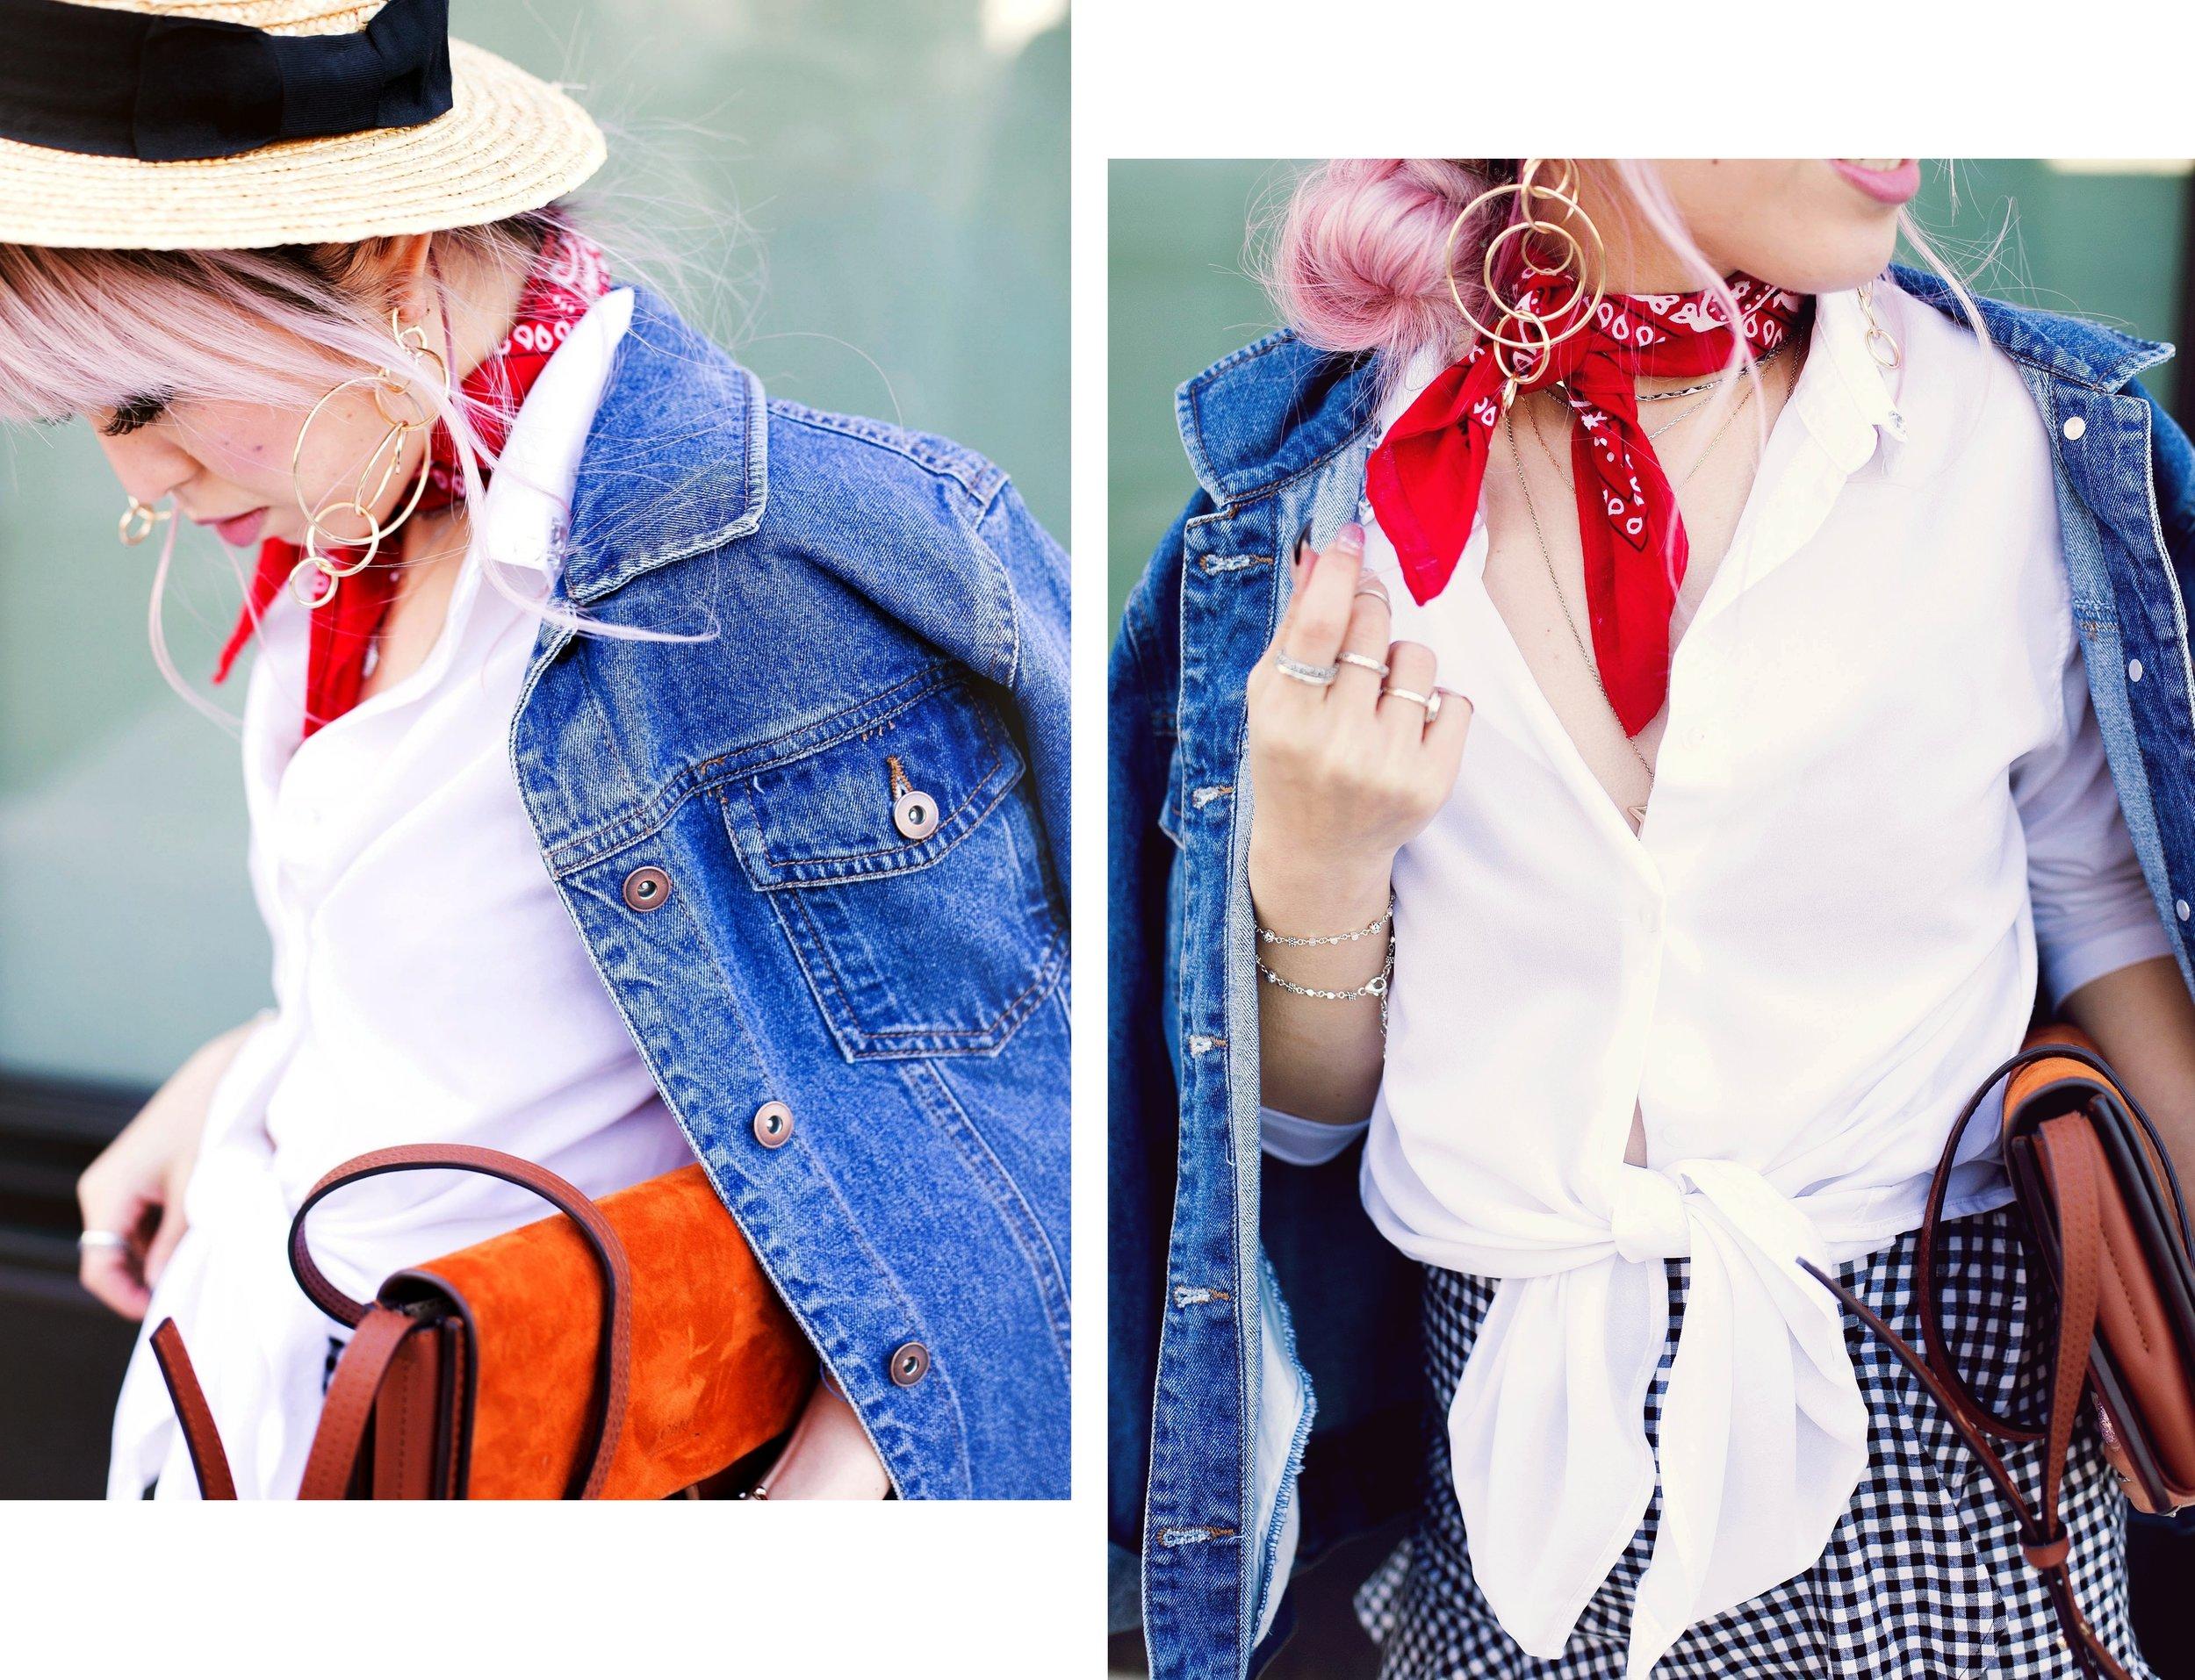 Forever 21 Denim jacket_H&M Straw hat_Urban Outfitter Red bandana_kohls kohl's button up shirt_ZARA statement earrings_H&M gingham mini skirt_Chloe Faye mini bag_ALDO Embroidered Mules_Aikas Love Closet_Seattle Fashion style logger_petite fashion 5